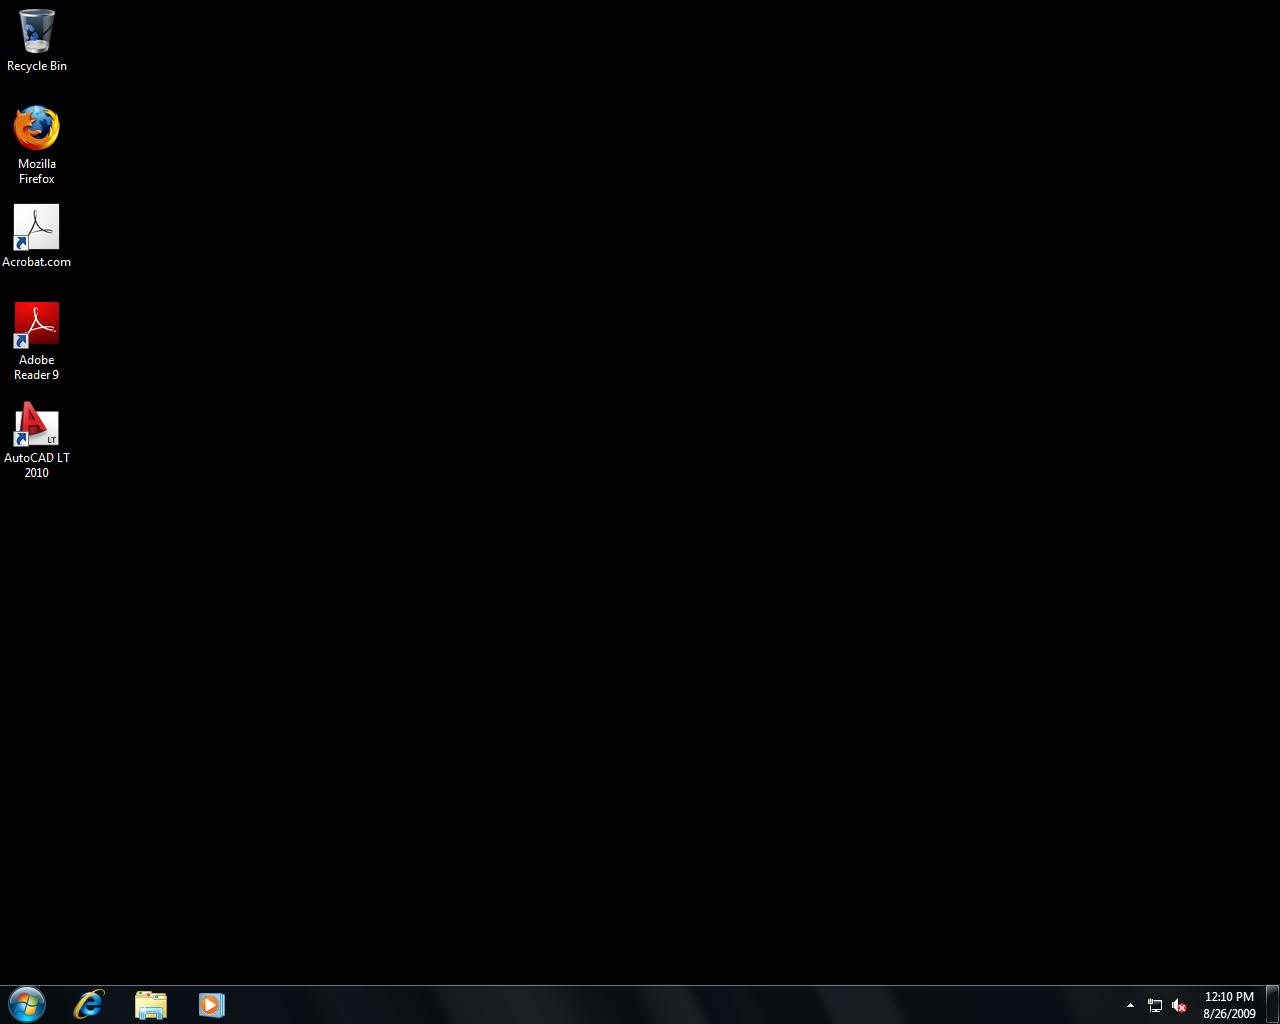 windows 7 desktop wallpaper gpo not working